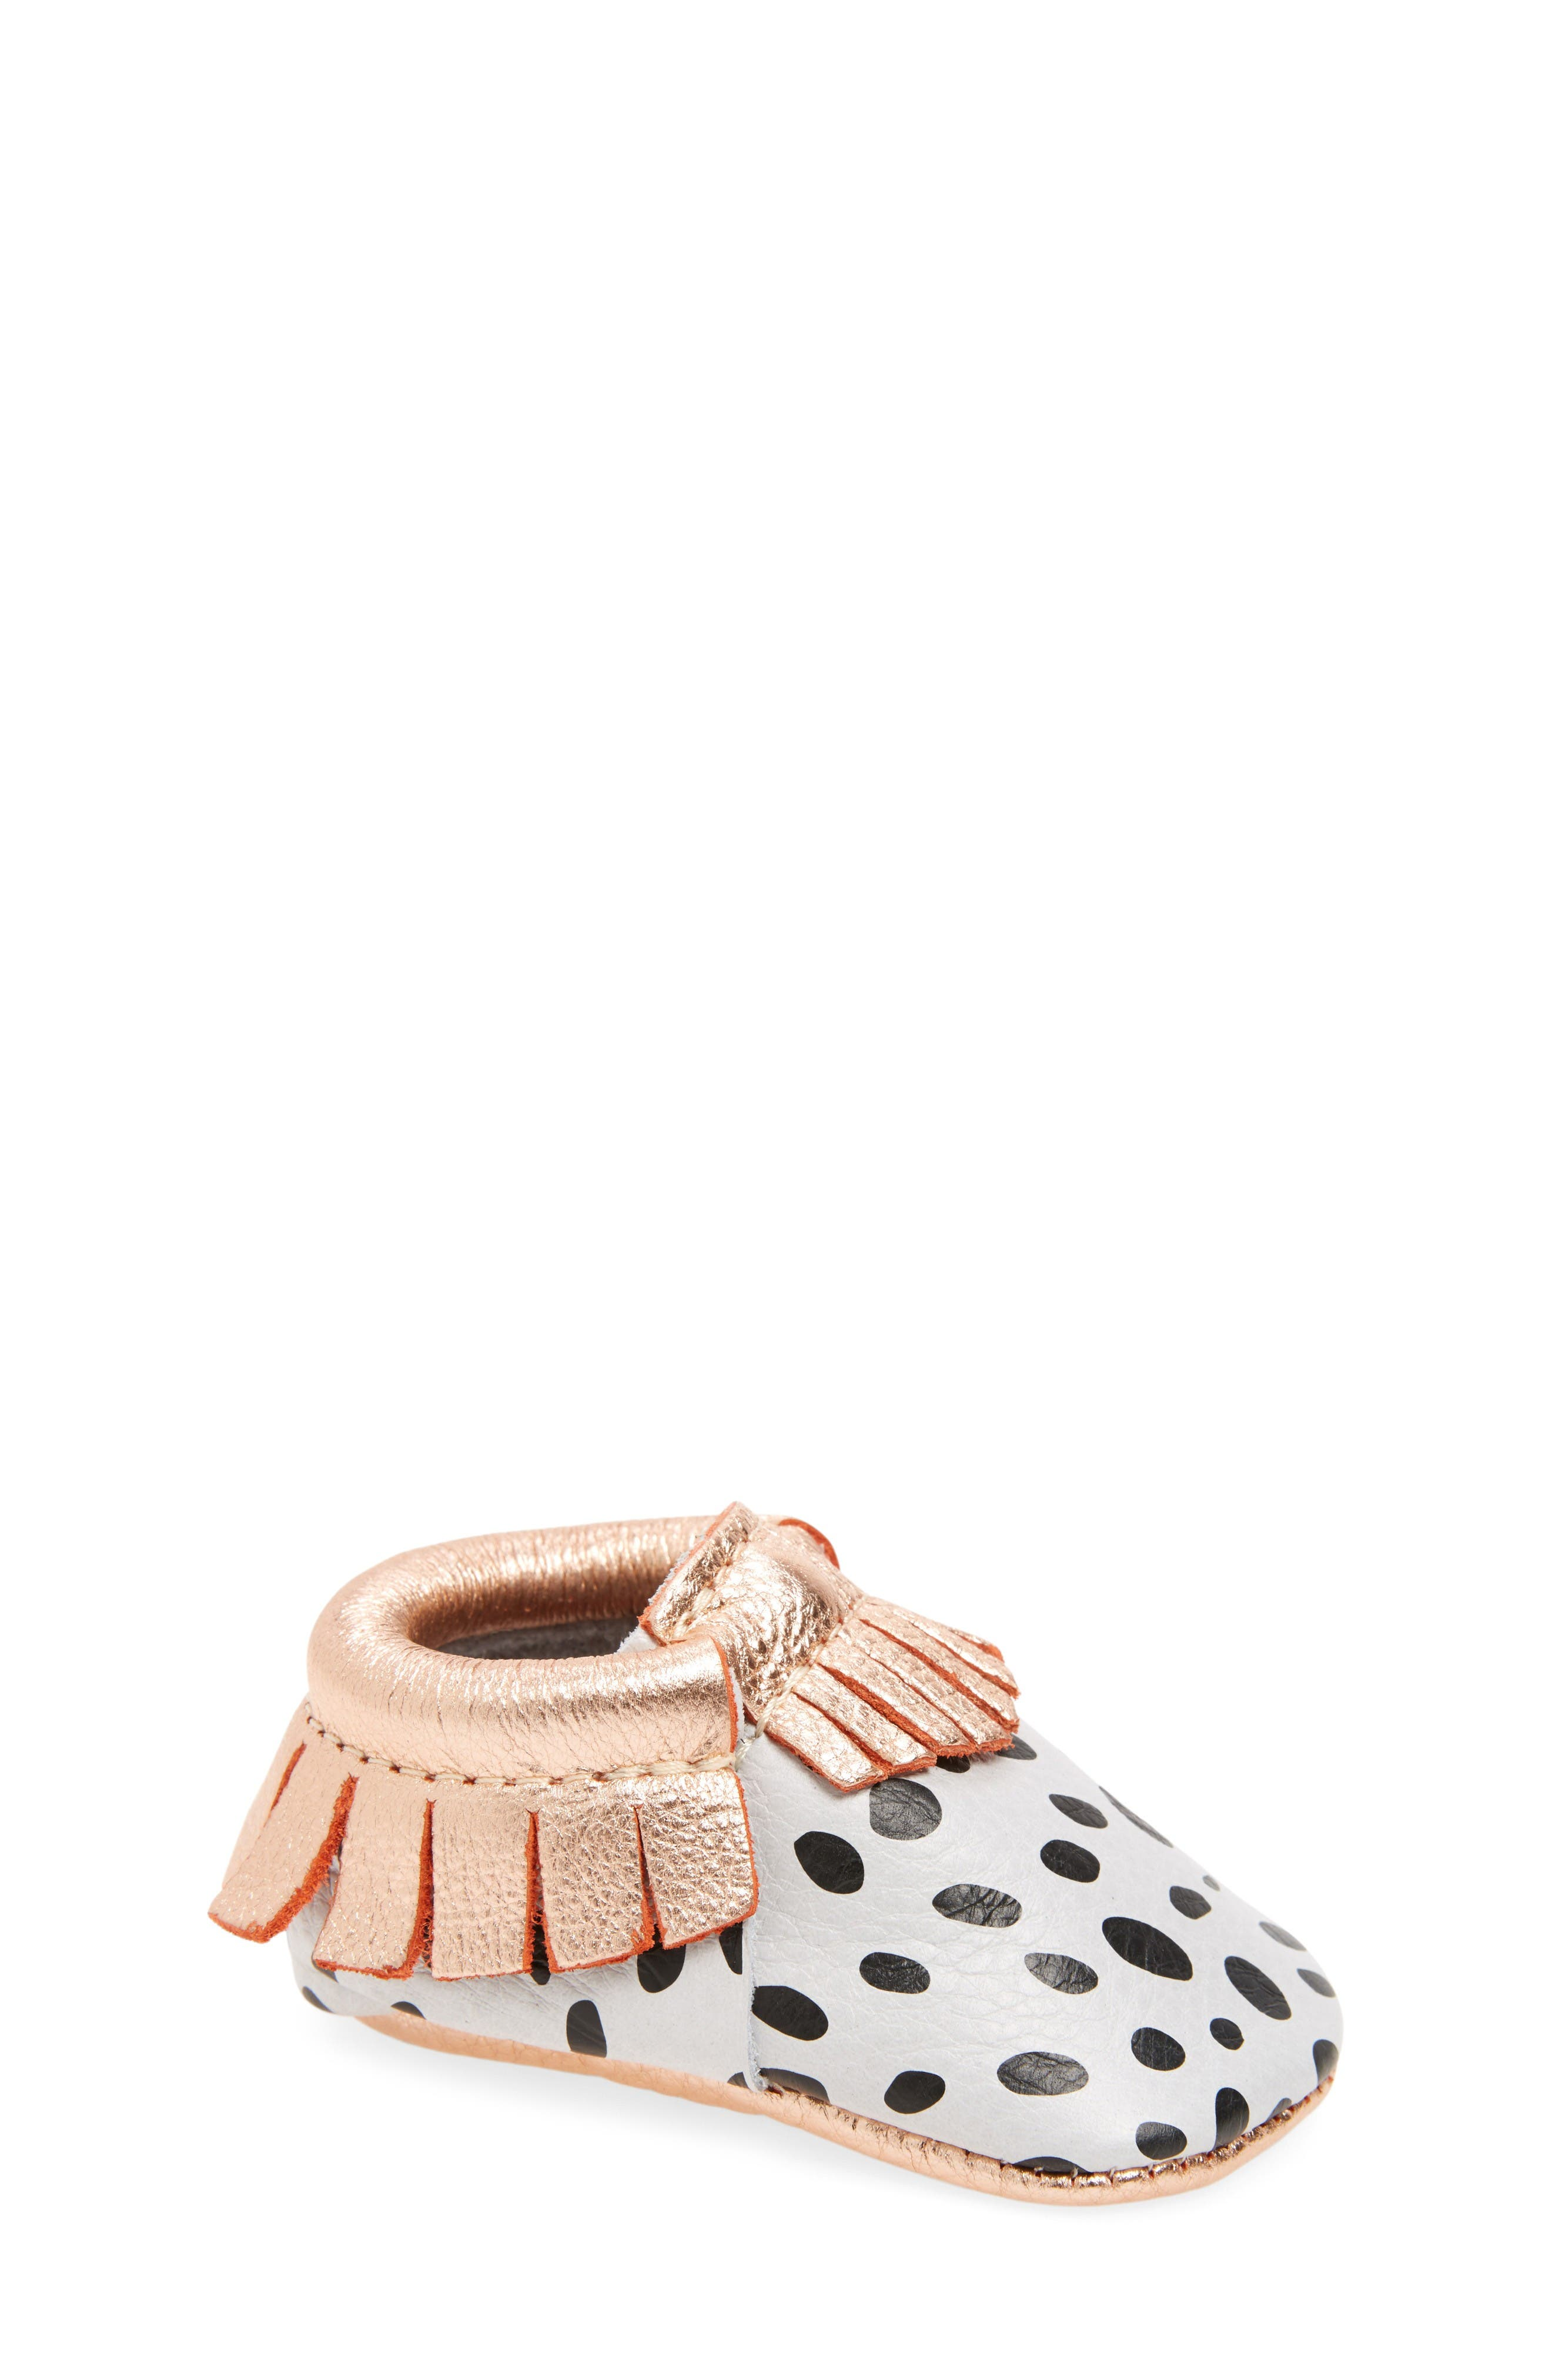 FRESHLY PICKED Dalmatian Moccasin